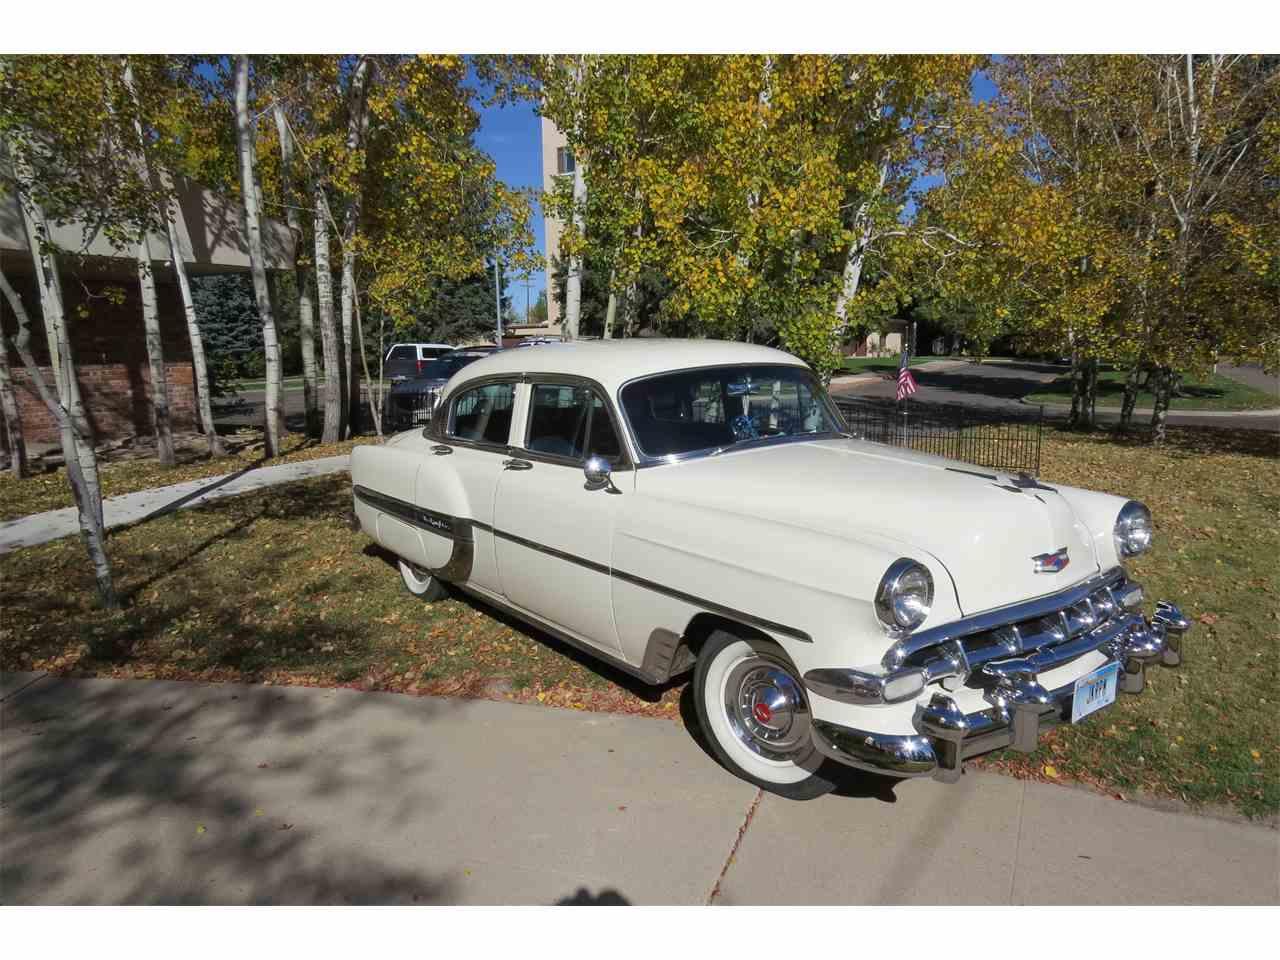 All Chevy 1954 chevrolet belair : 1954 Chevrolet Bel Air for Sale | ClassicCars.com | CC-889606